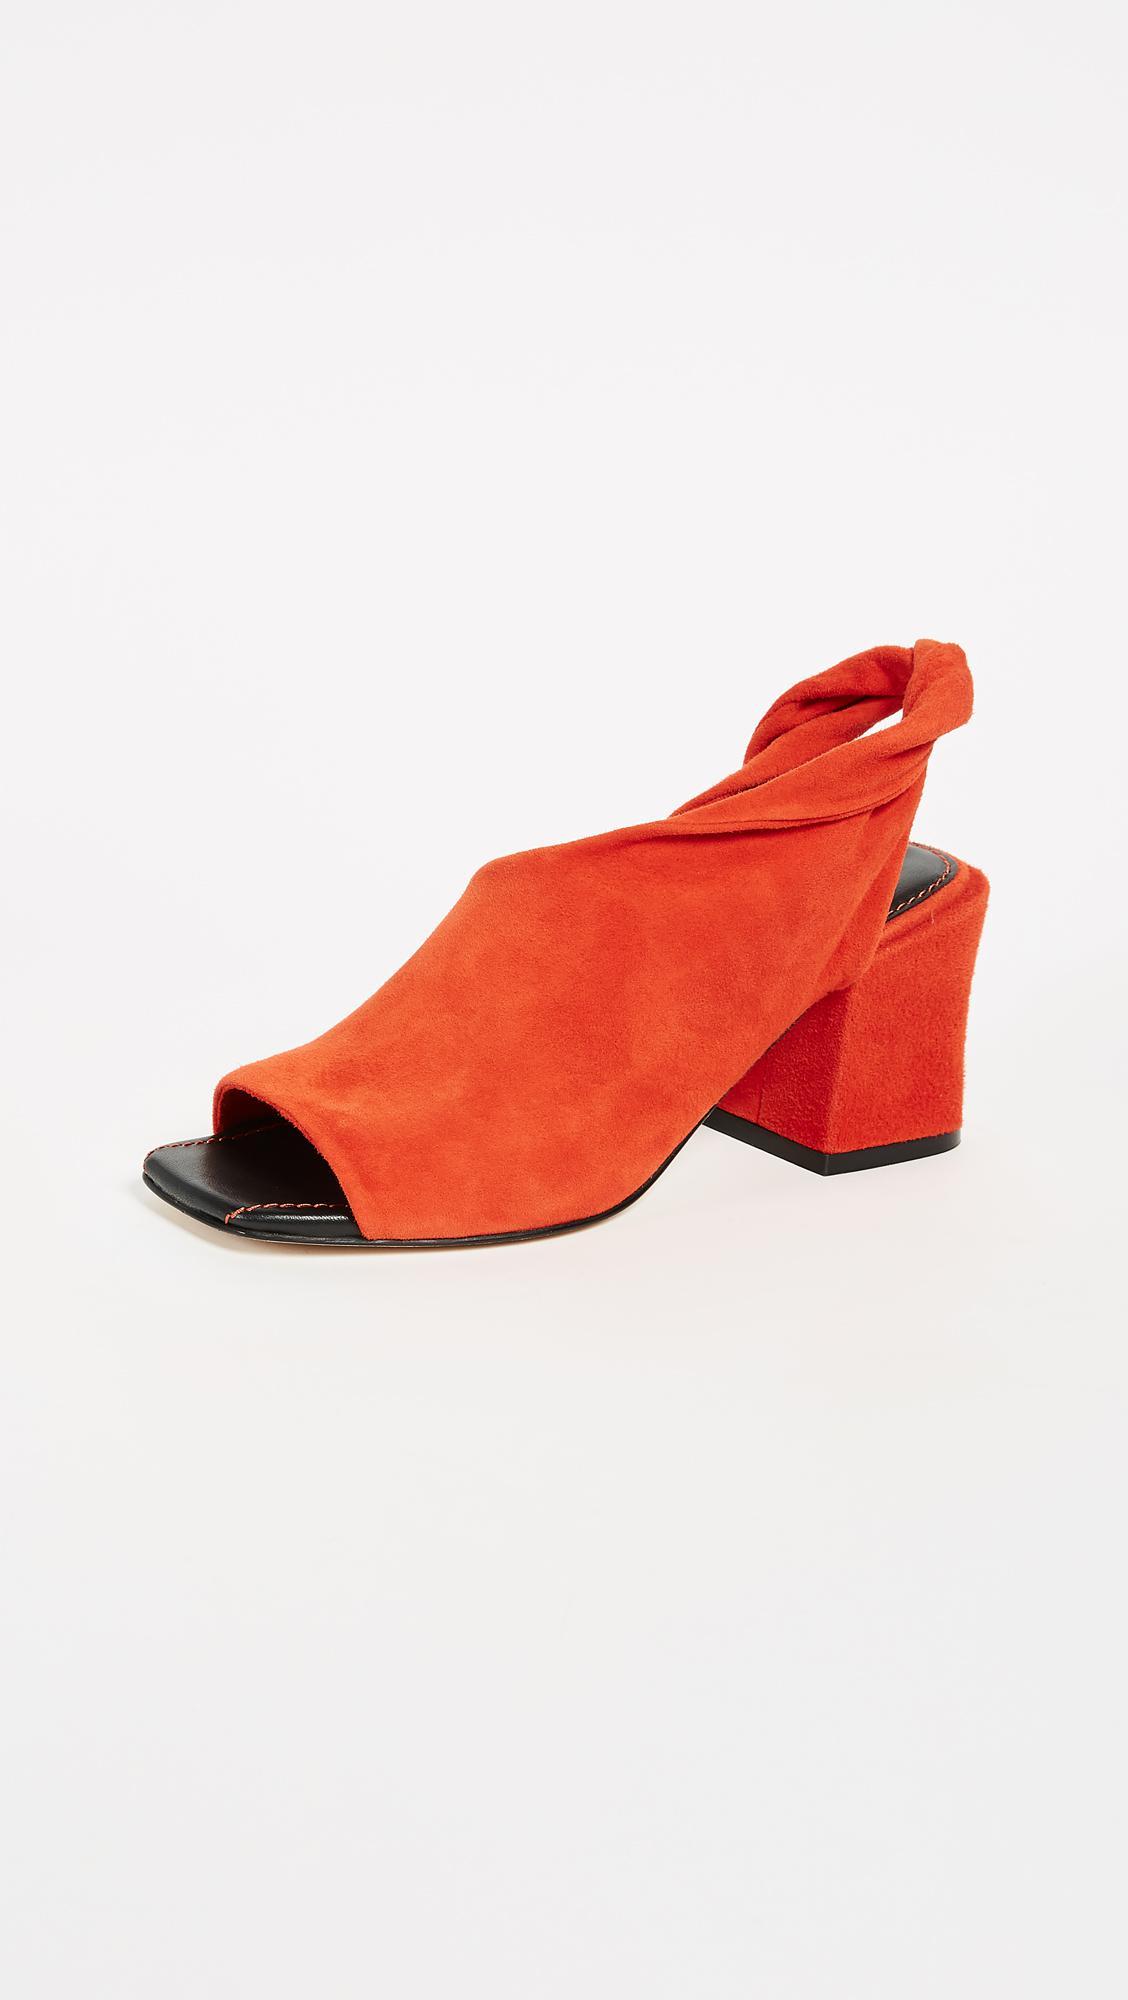 block heel sling back sandals - Yellow & Orange Sigerson Morrison RDulQzL